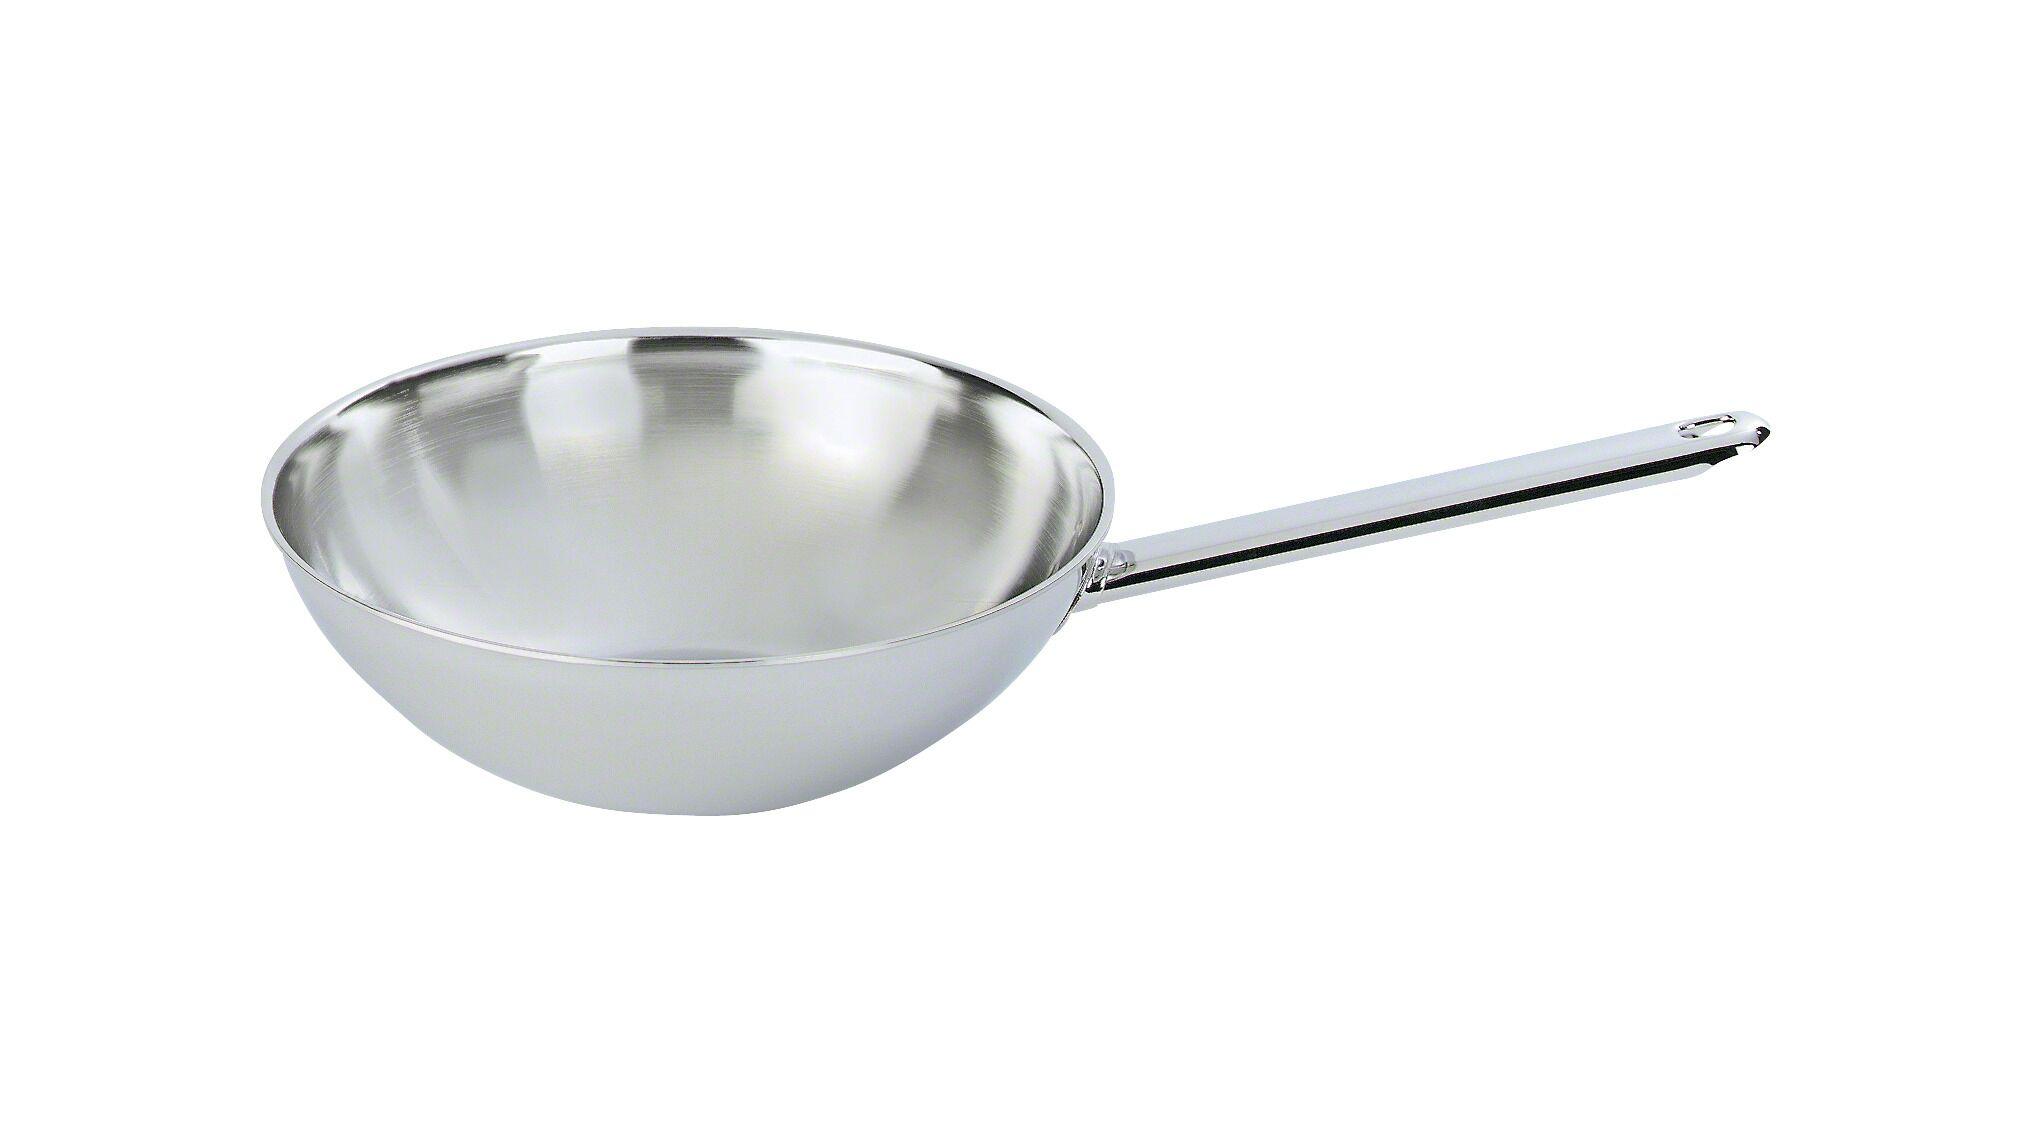 Demeyere Wok i rustfrit stål, Wok, 30 cm